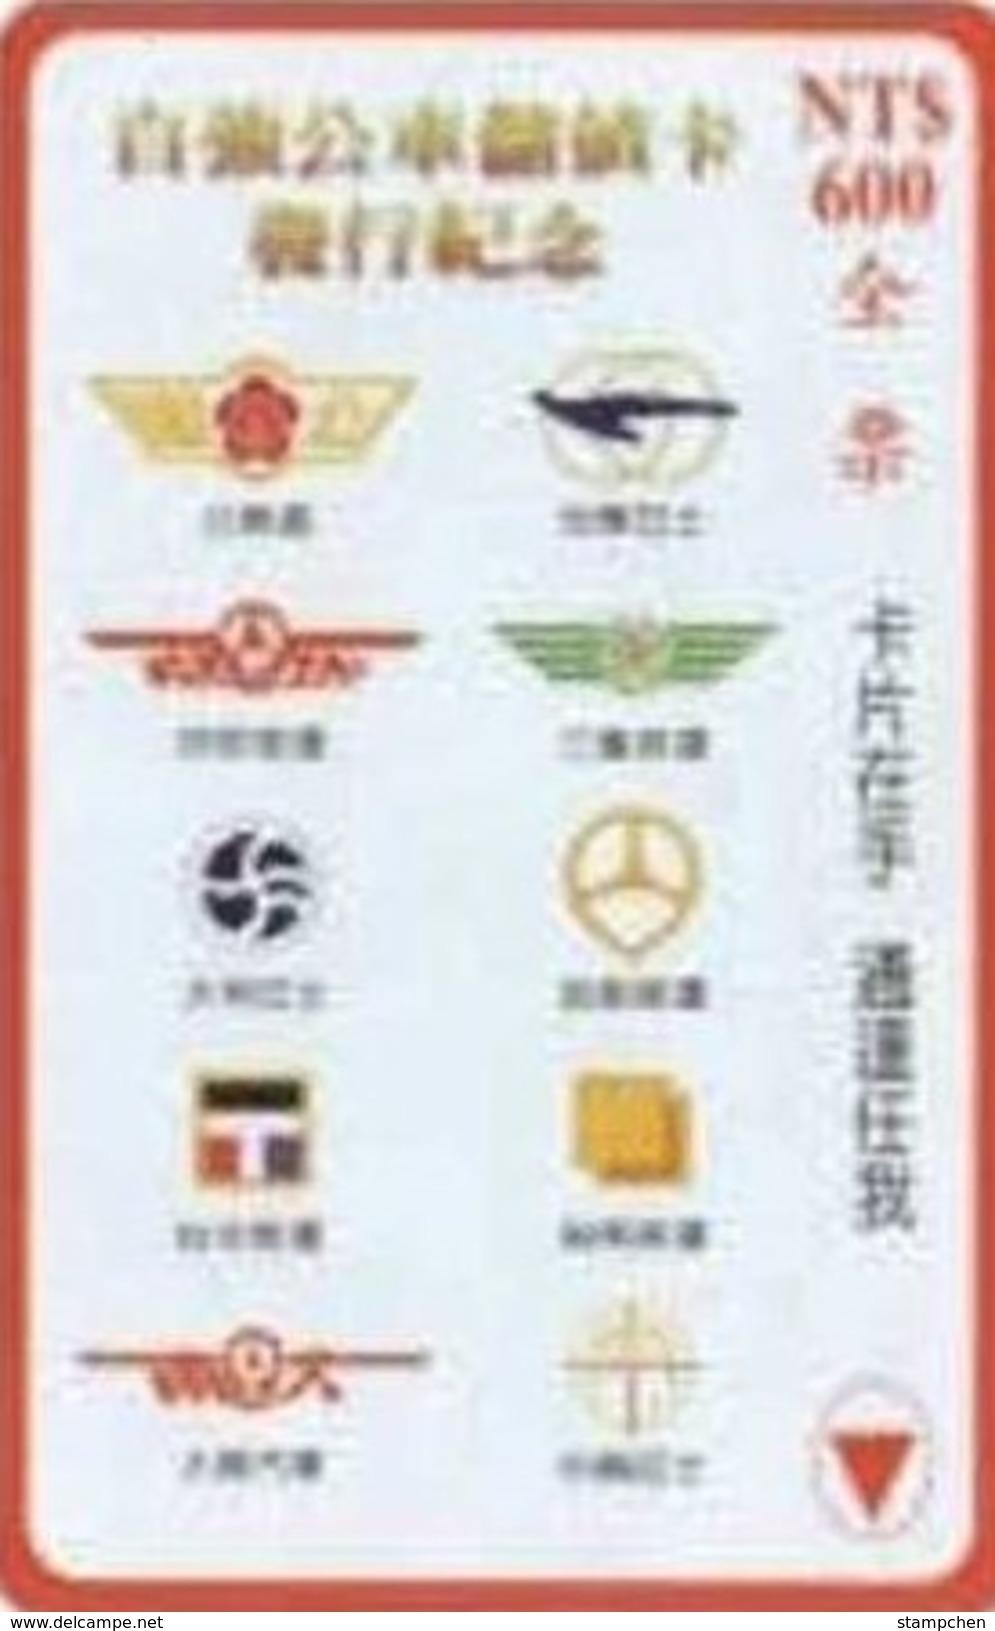 Taiwan Early Bus Ticket Emblem (A0001) - Cars